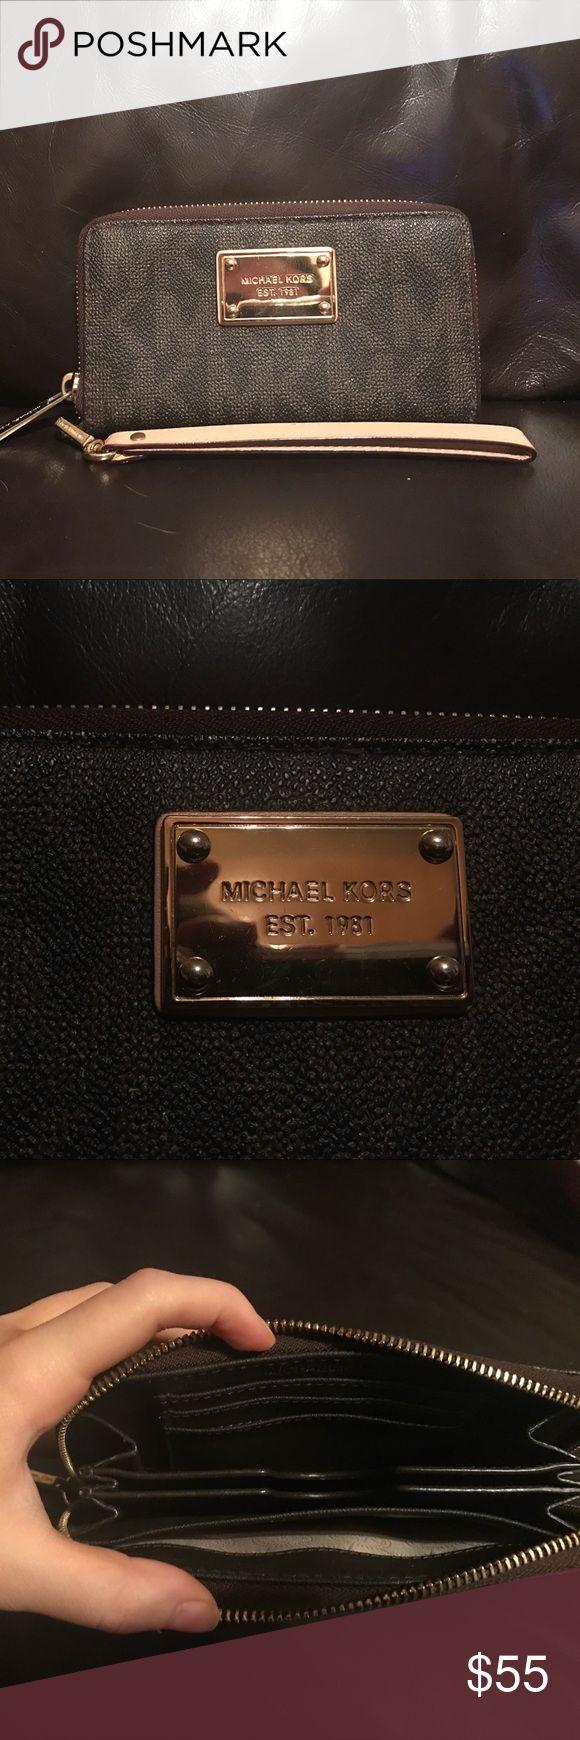 Michael Kors Wallet Brown Michael Kors Wallet. In great condition. Michael Kors Bags Wallets